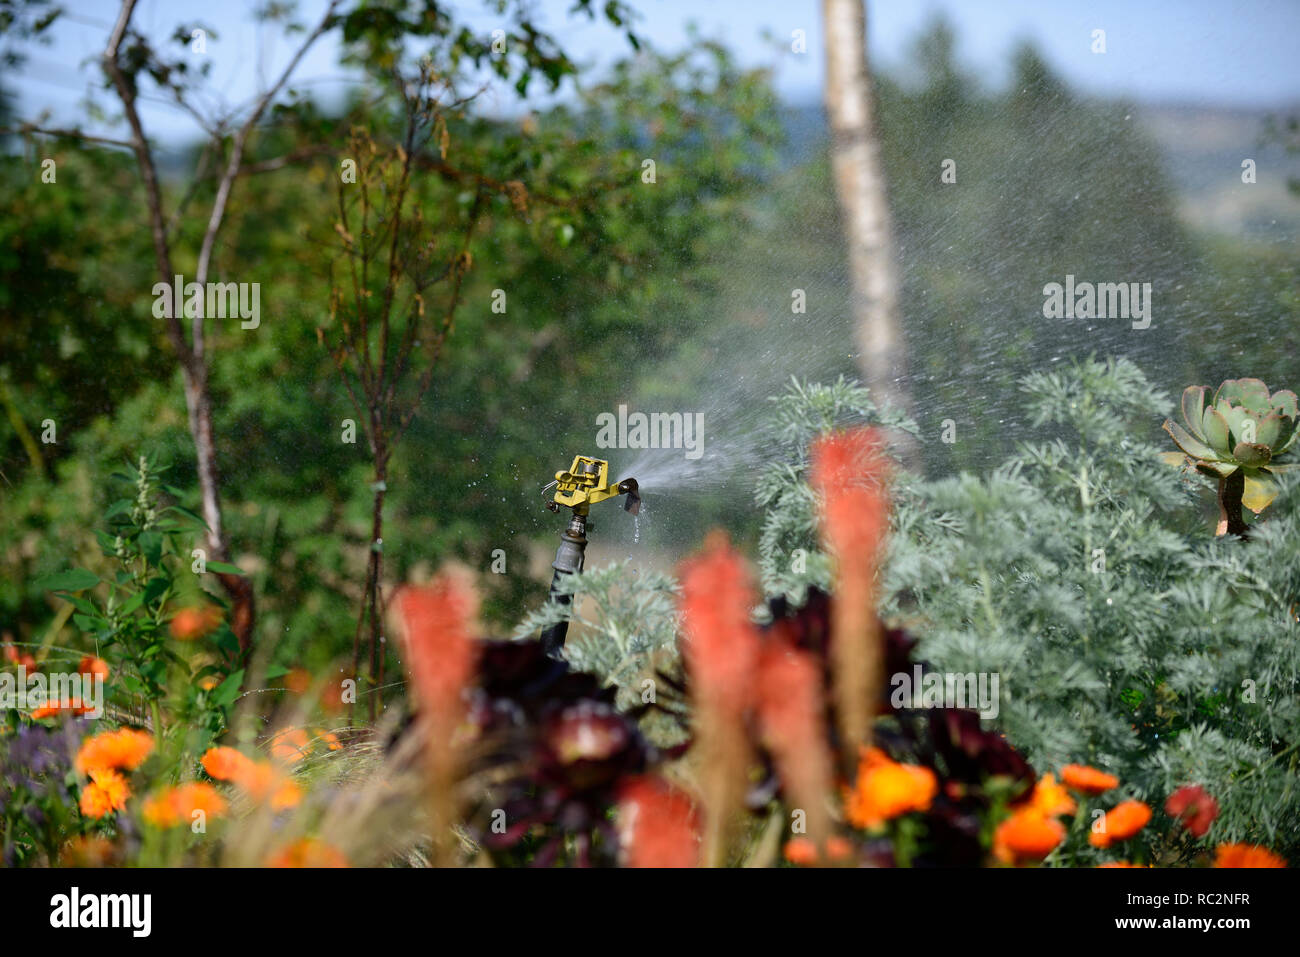 garden sprinkler,water,watering the garden,summer,hot dry weather,water conservation,gardens,gardening,RM Floral - Stock Image